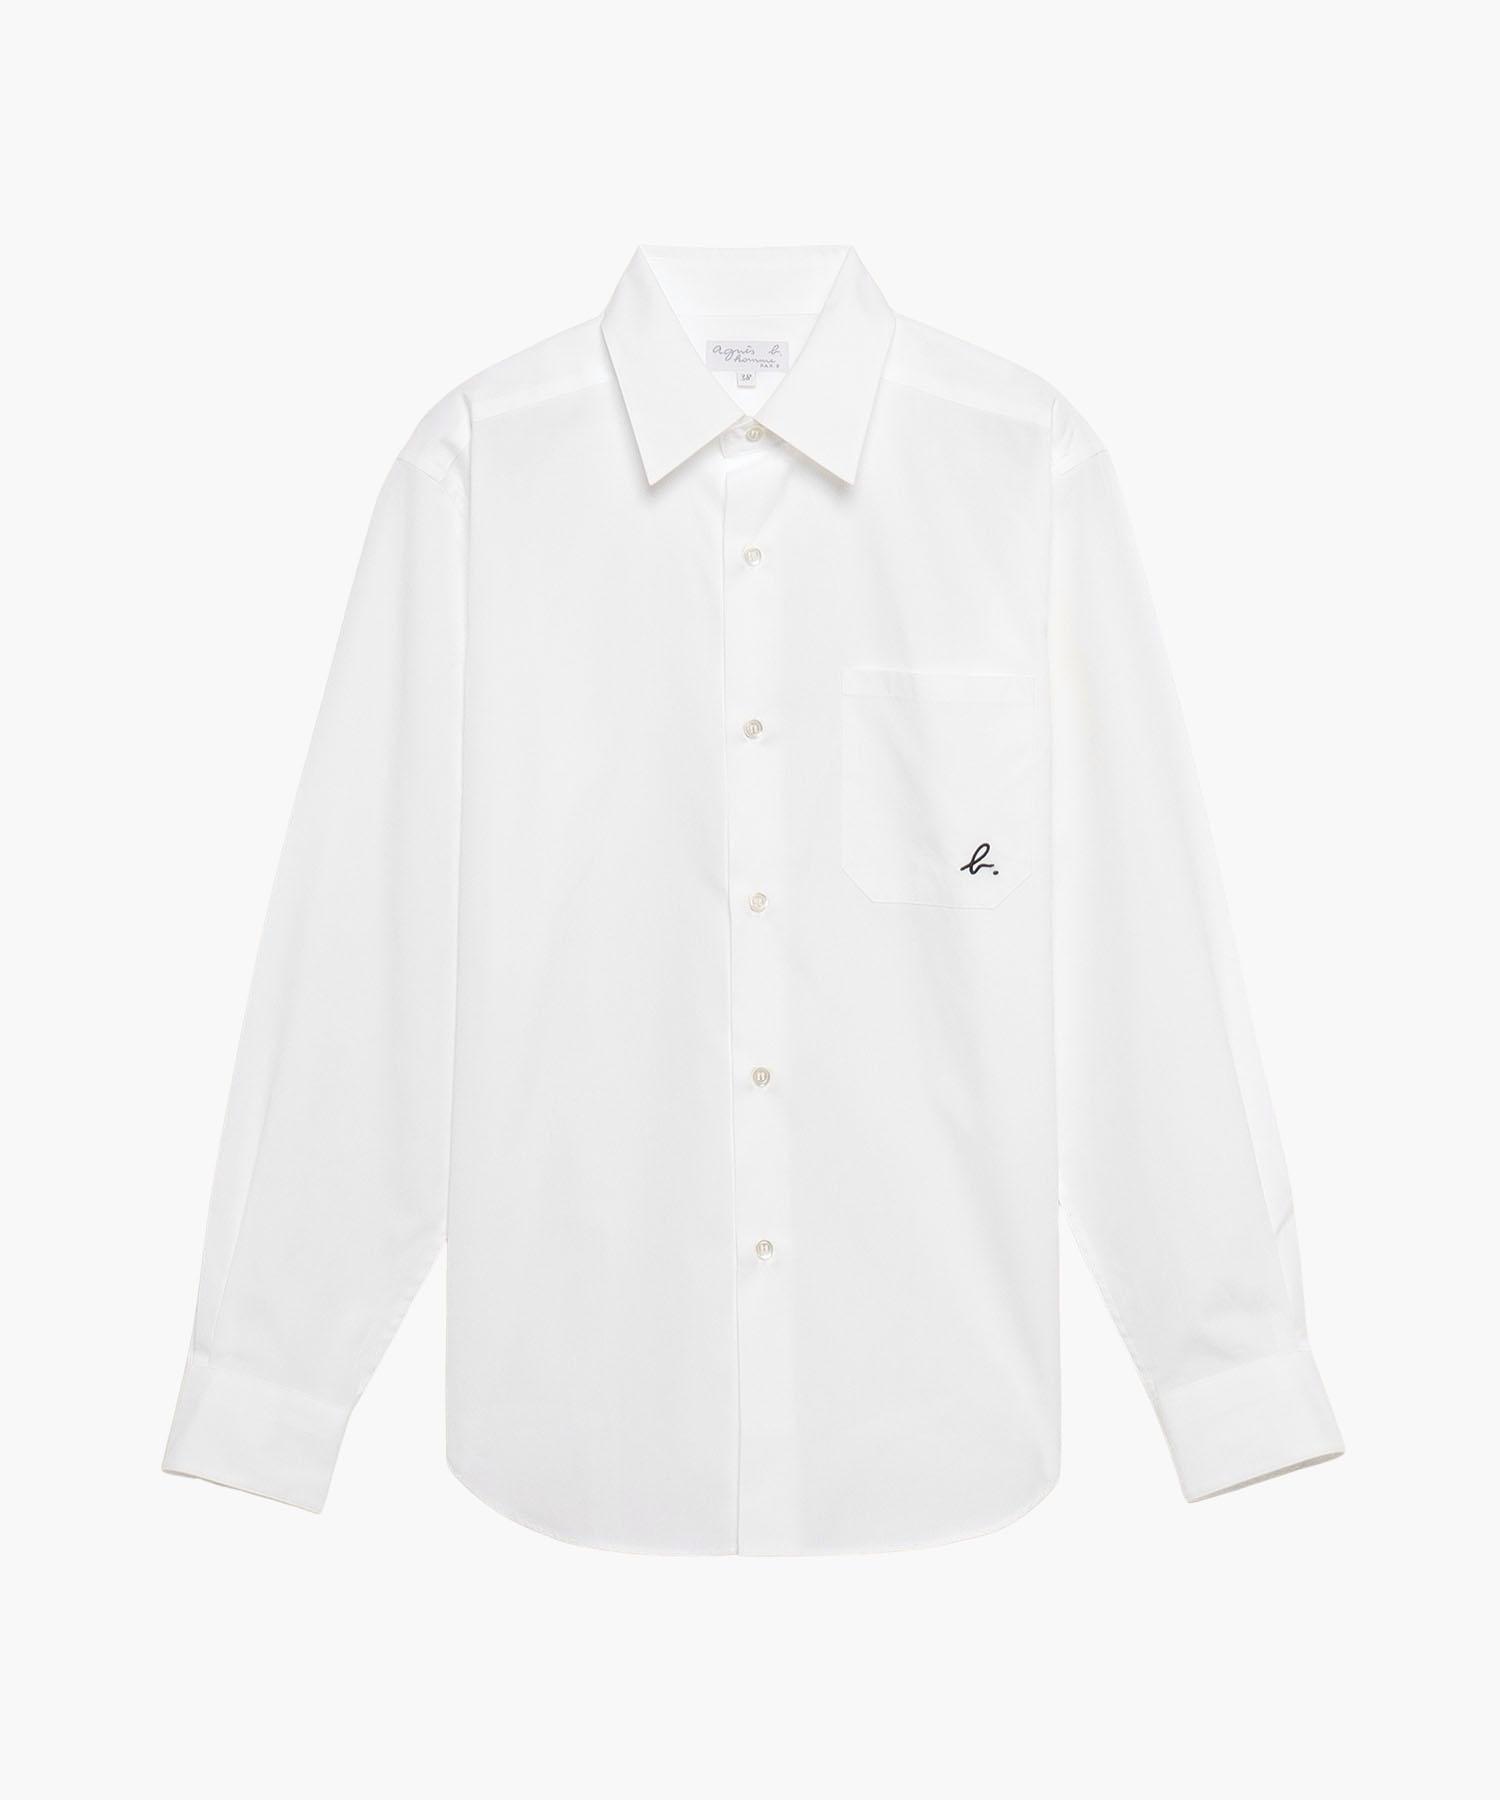 【WEB限定】UQ25 CHEMISE b.ロゴコットンシャツ